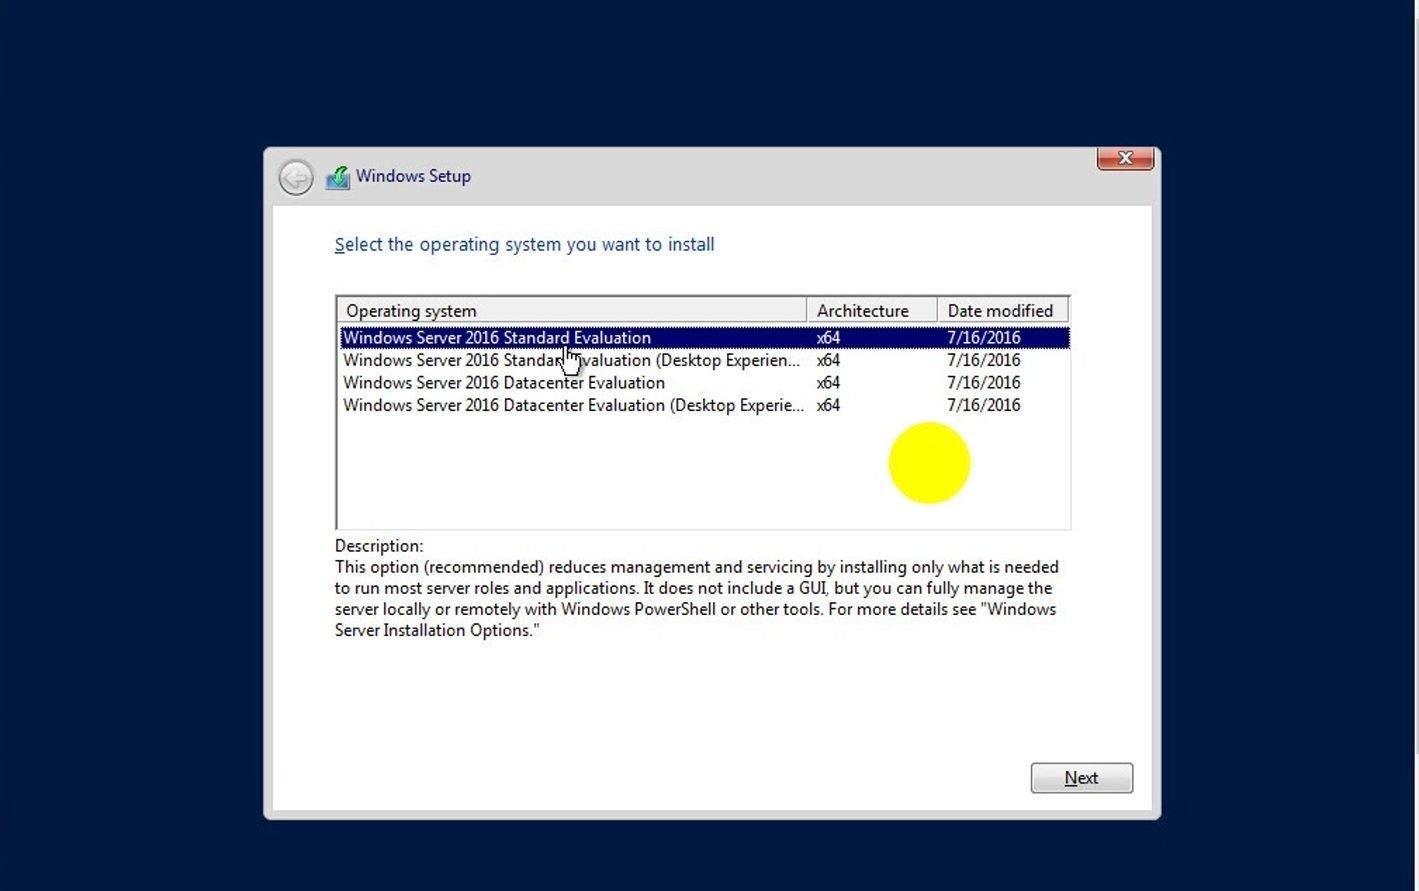 ITFORVN Bài 1 Part1 Cài đặt Windows Server 2016 22 e1491171774436 - [Tự học MCSA MCSE 2016] - Lab-1-Part1-Cài đặt Windows Server 2016